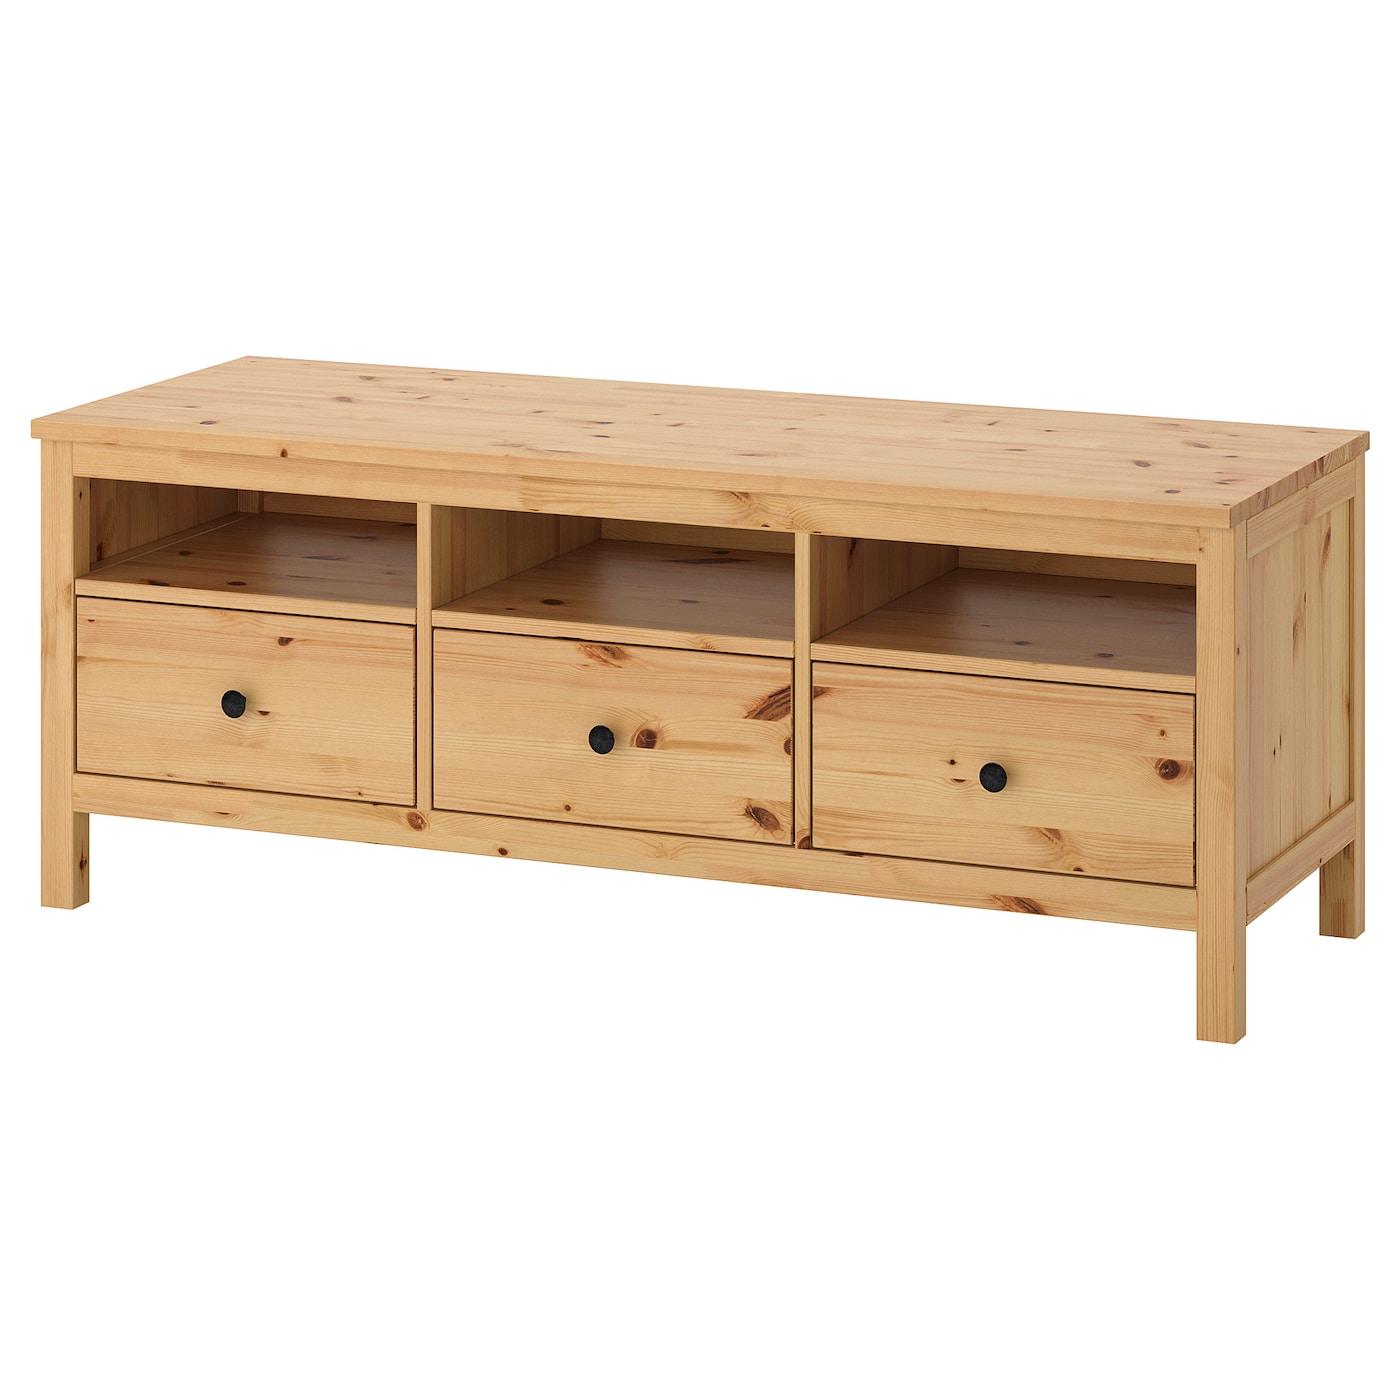 Hemnes Banc Tv Brun Clair 148x47x57 Cm Ikea